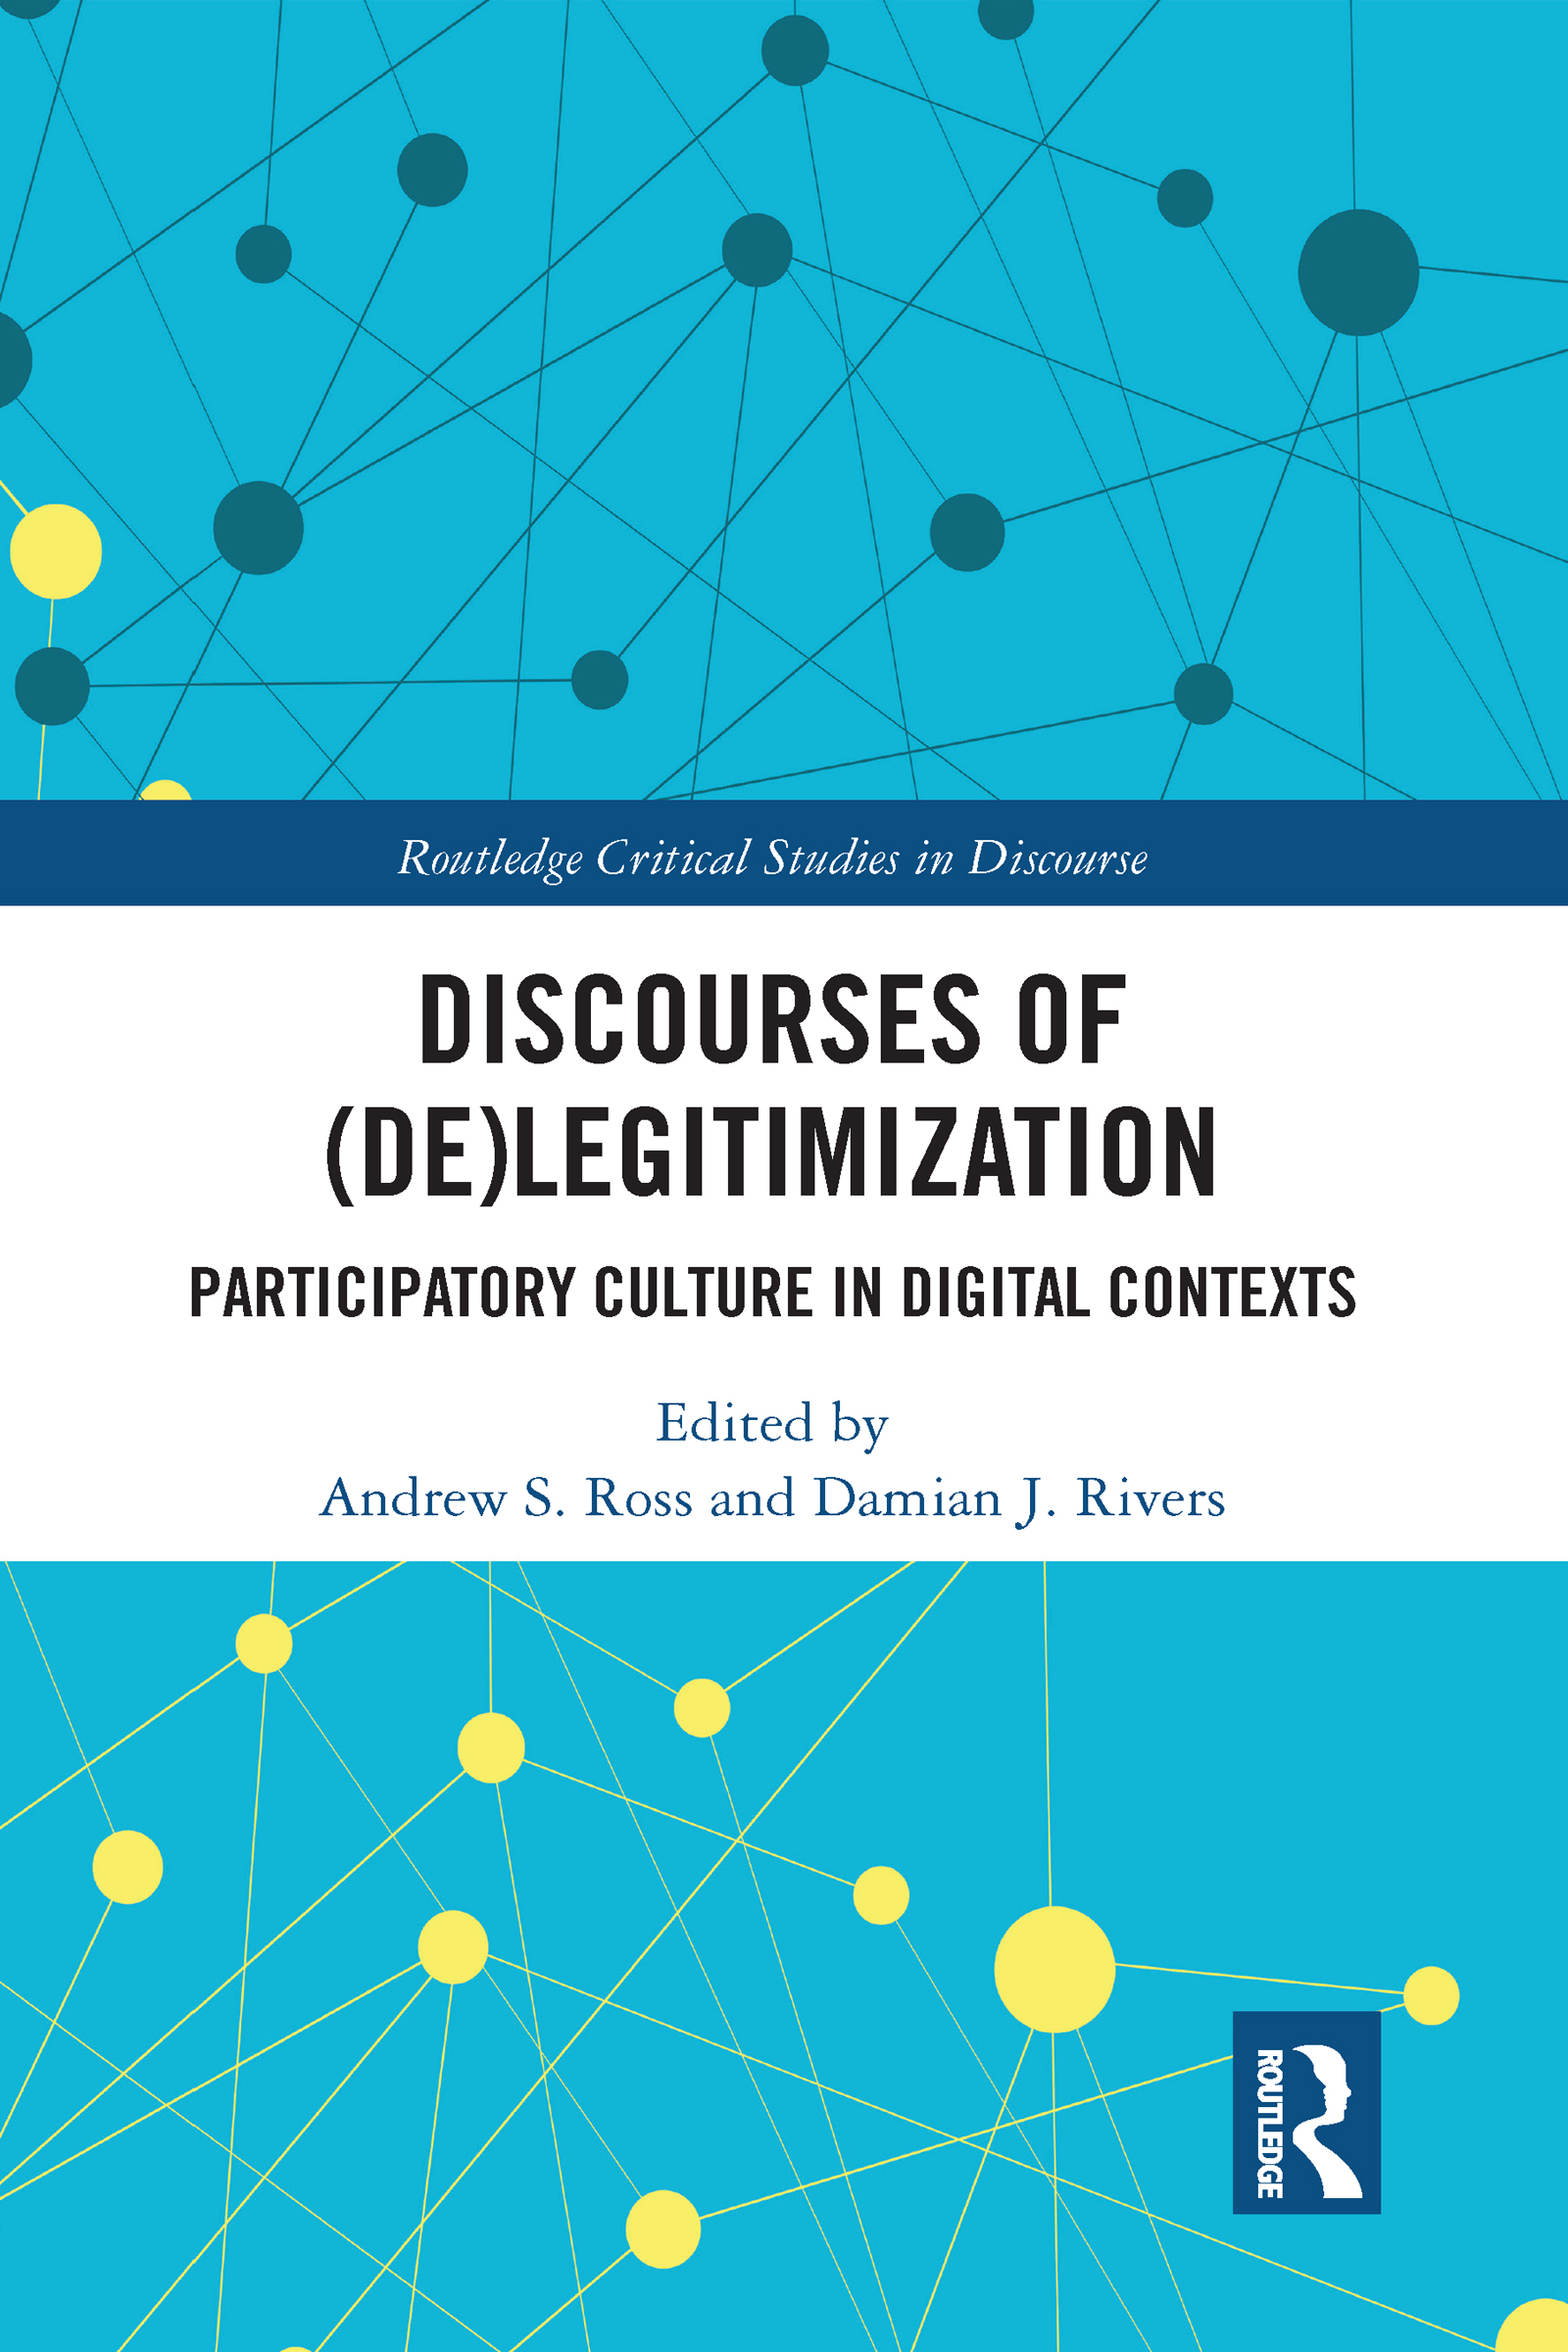 Discourses of (De)Legitimization